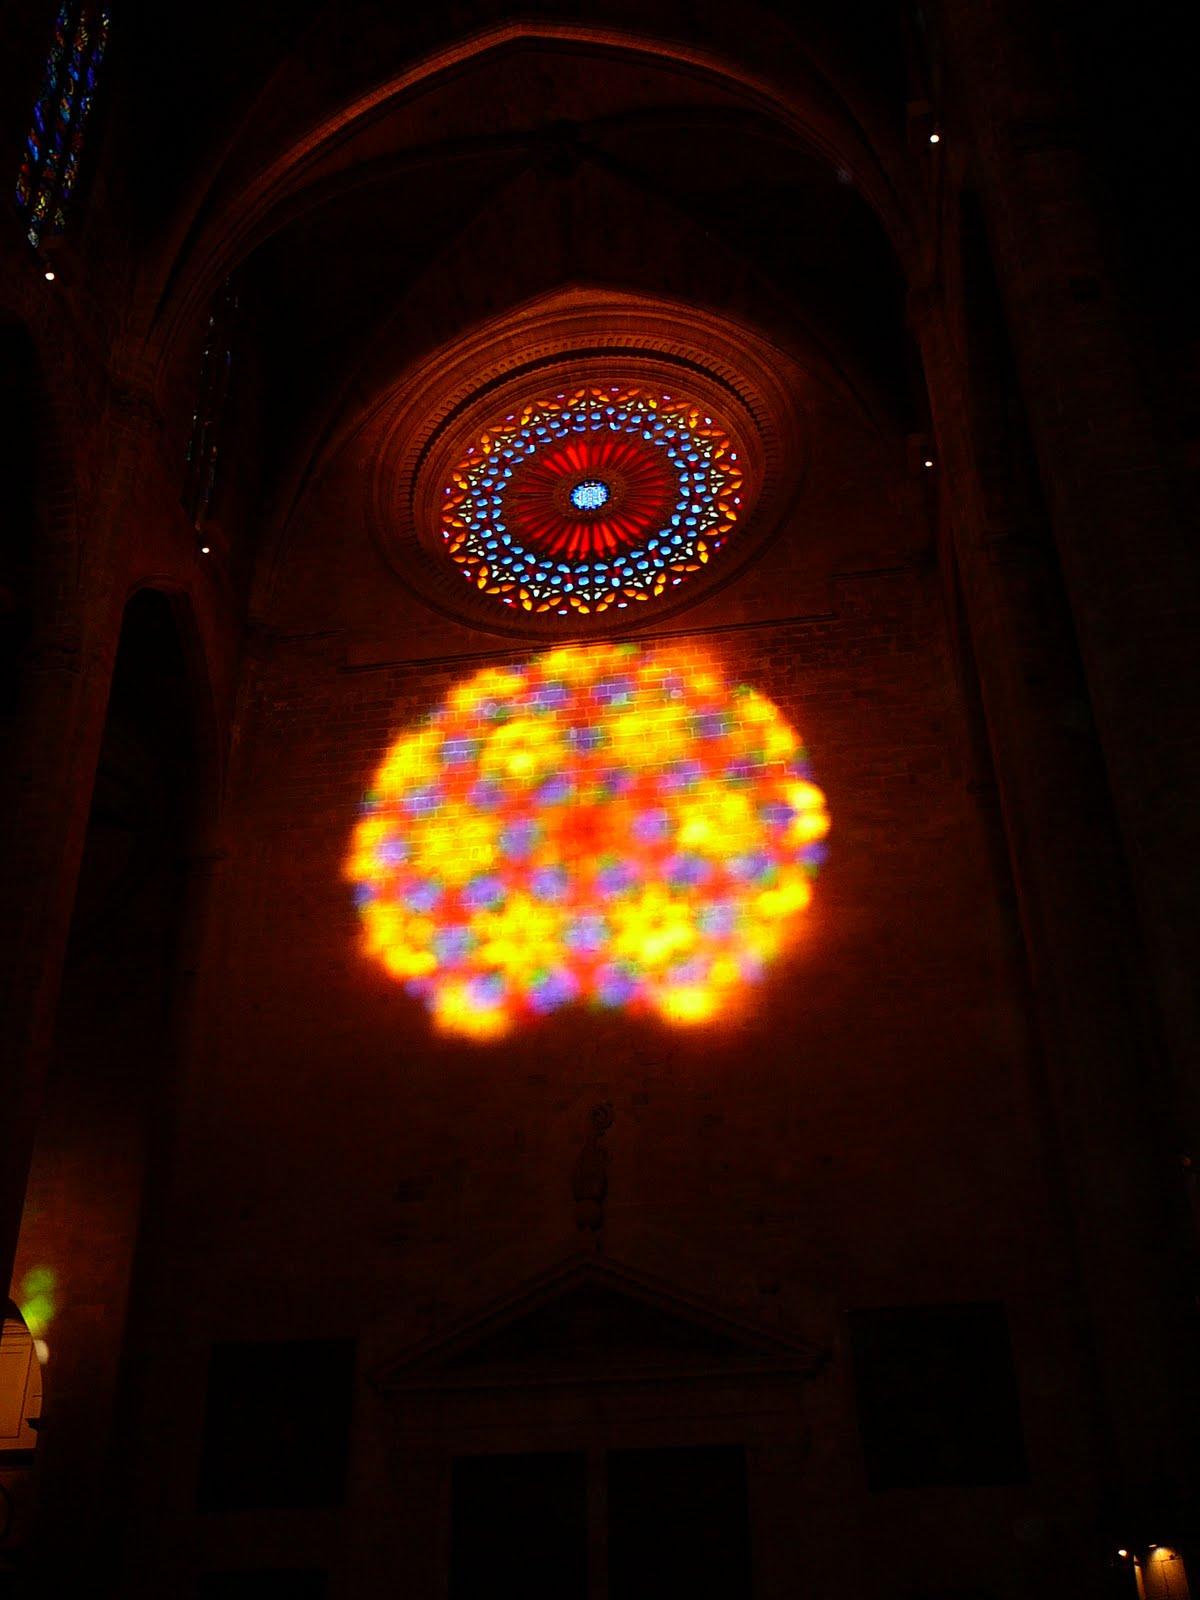 Magical light show in Palma's Cathedral, La Seu.